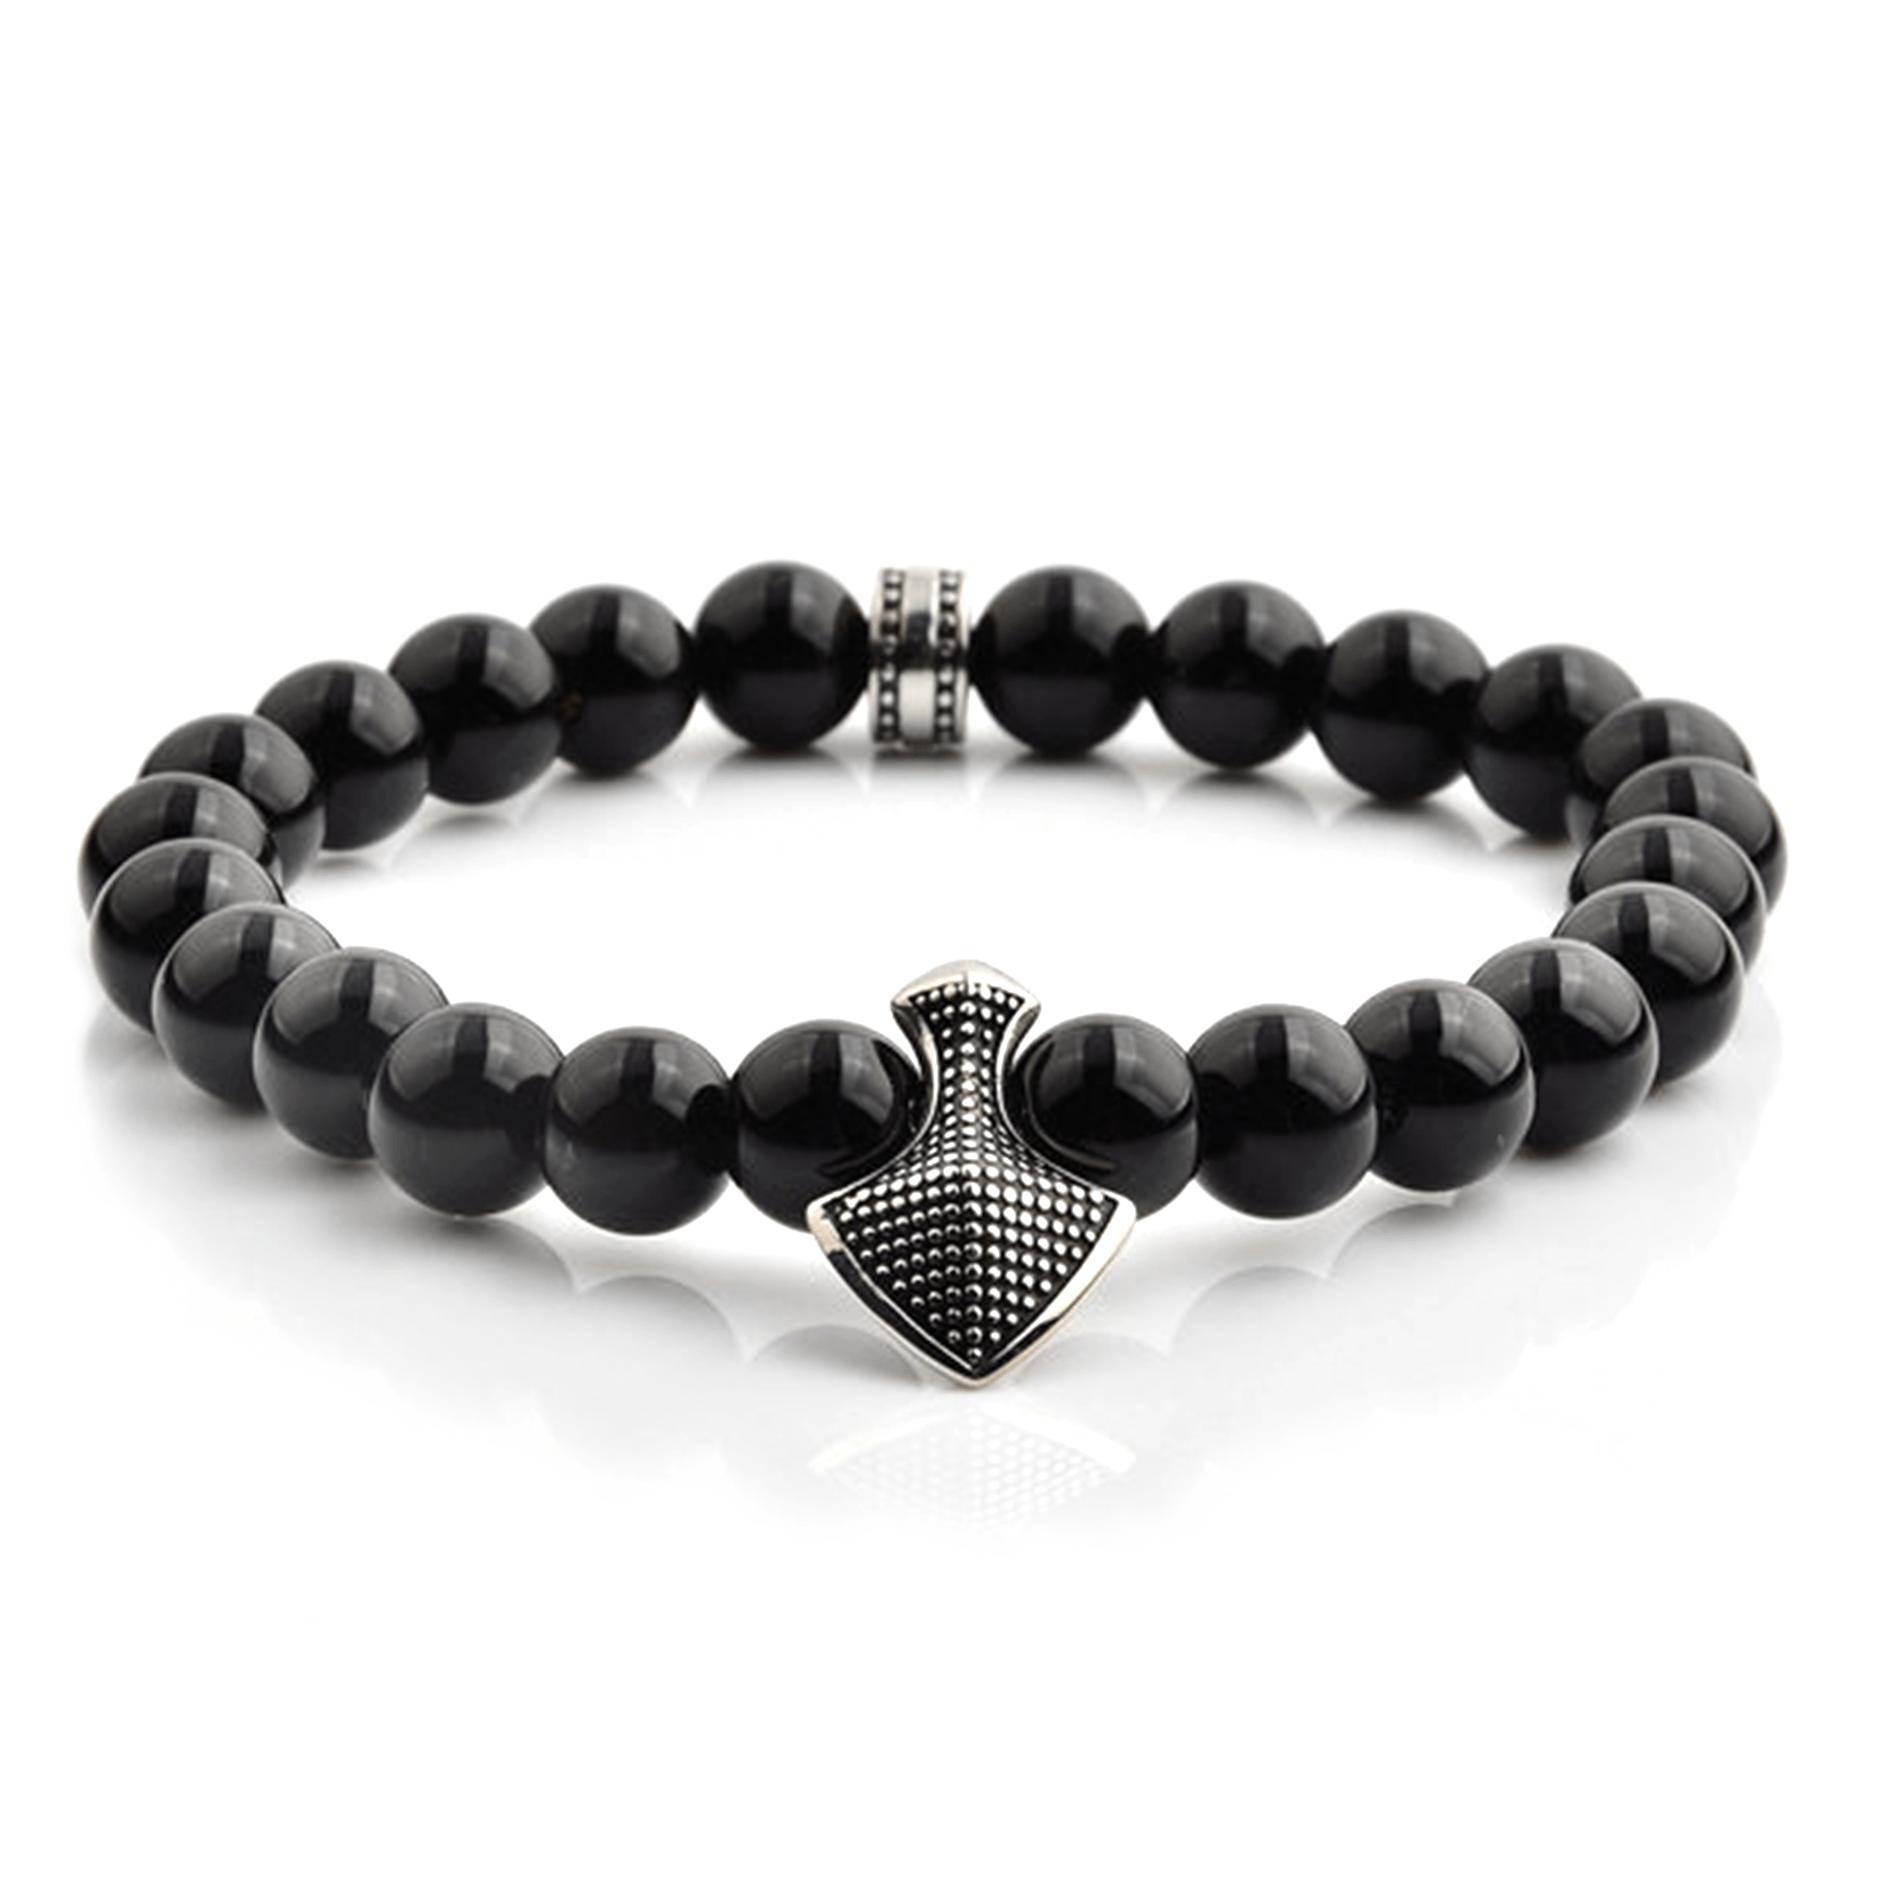 HYLIZO X Series 372 - Black Gloss Shield Edition bracelet with 316 Stainless Steel Shield